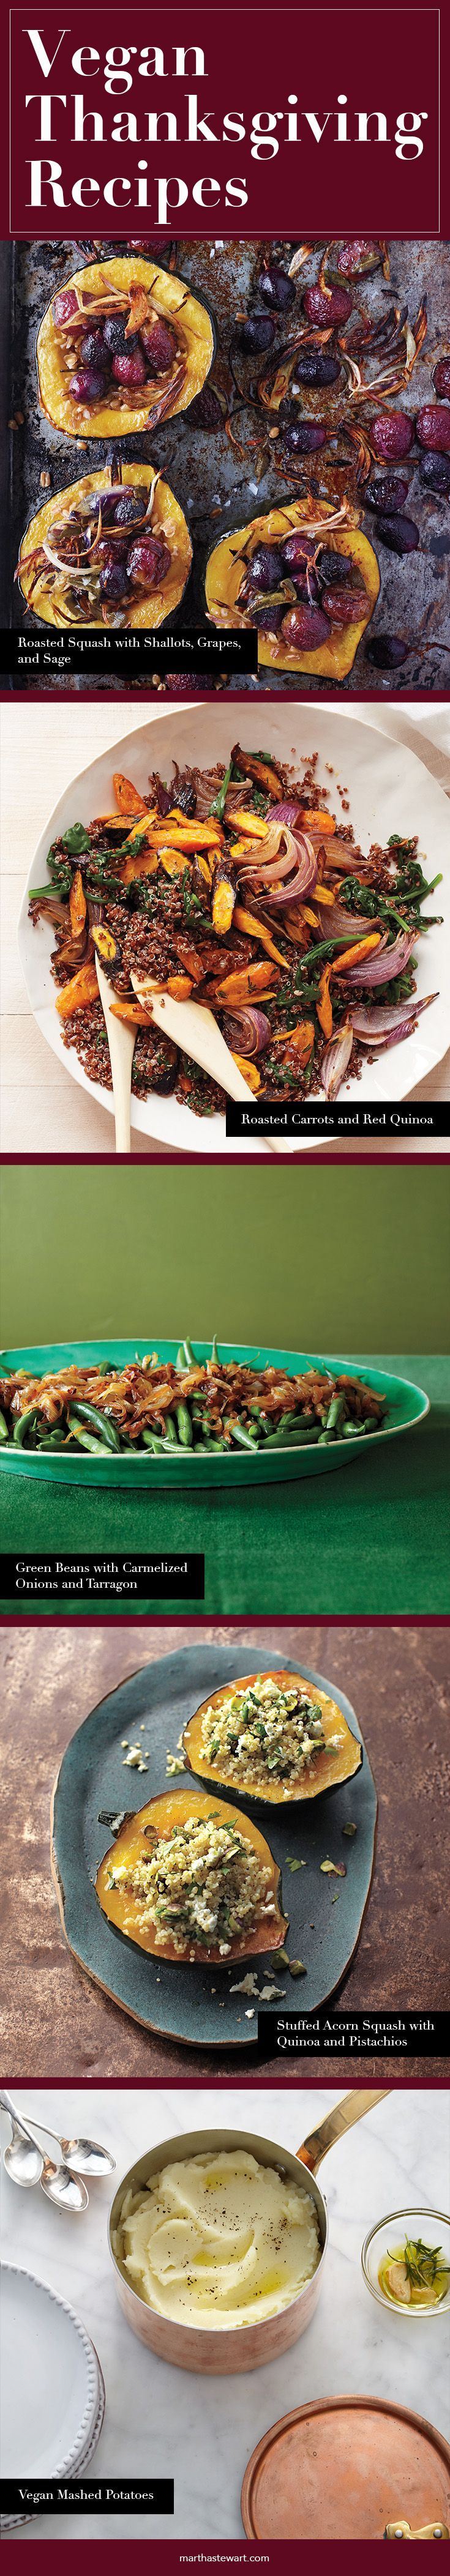 Vegan Thanksgiving Recipes | Martha Stewart Living